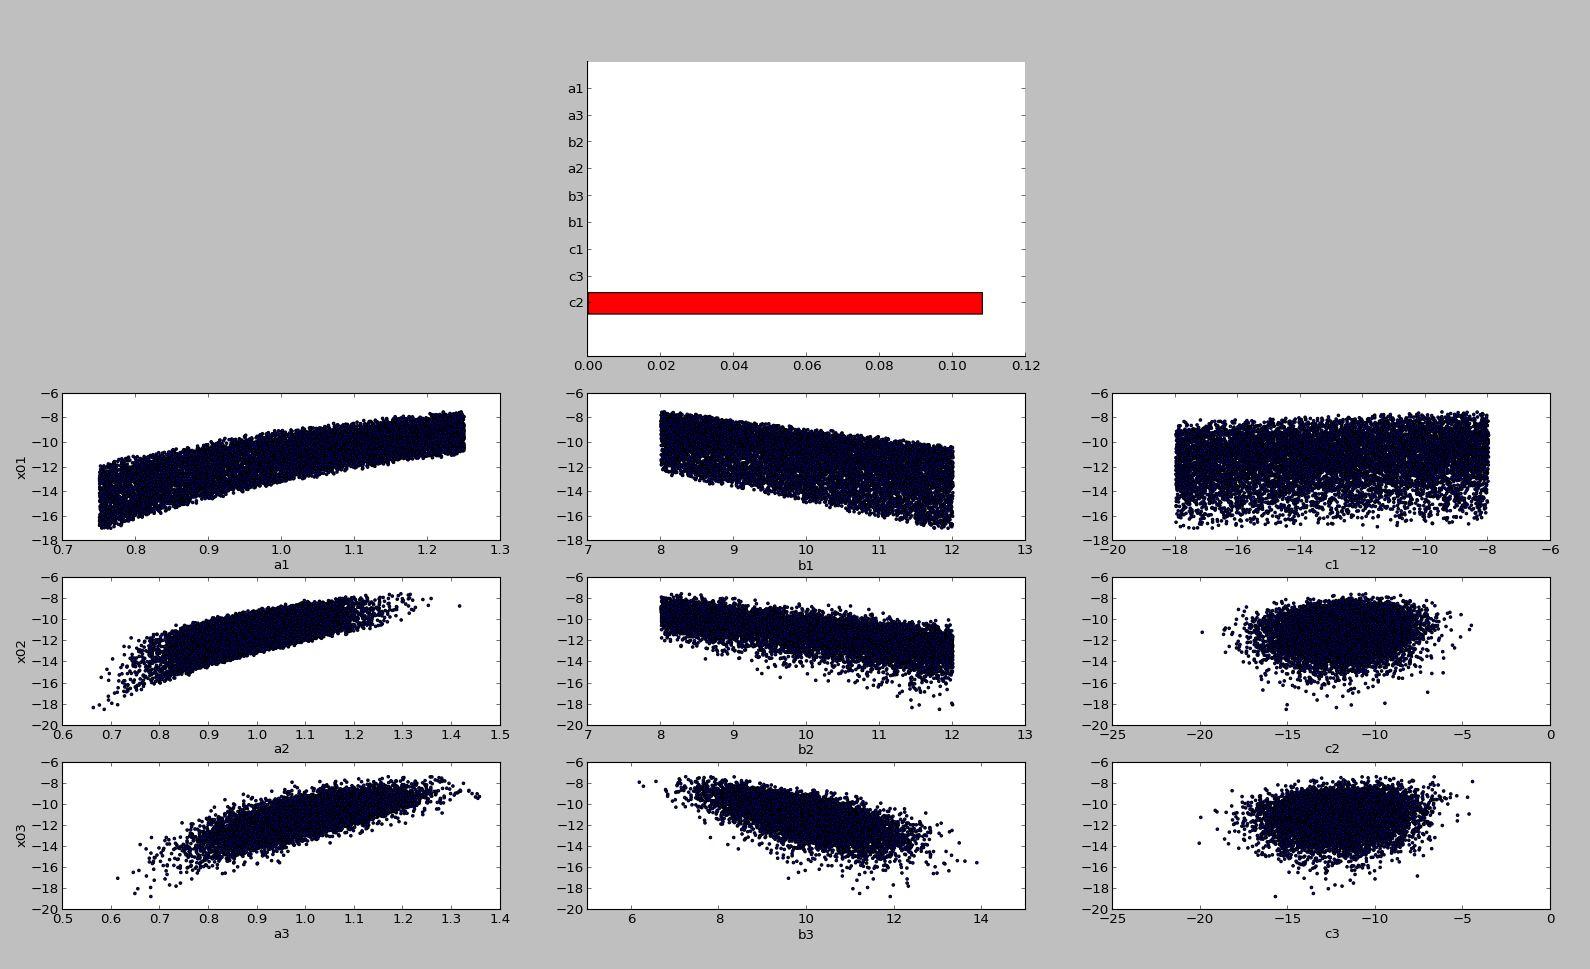 python - Matplotlib: Gridspec not displaying bar subplot - Stack Overflow